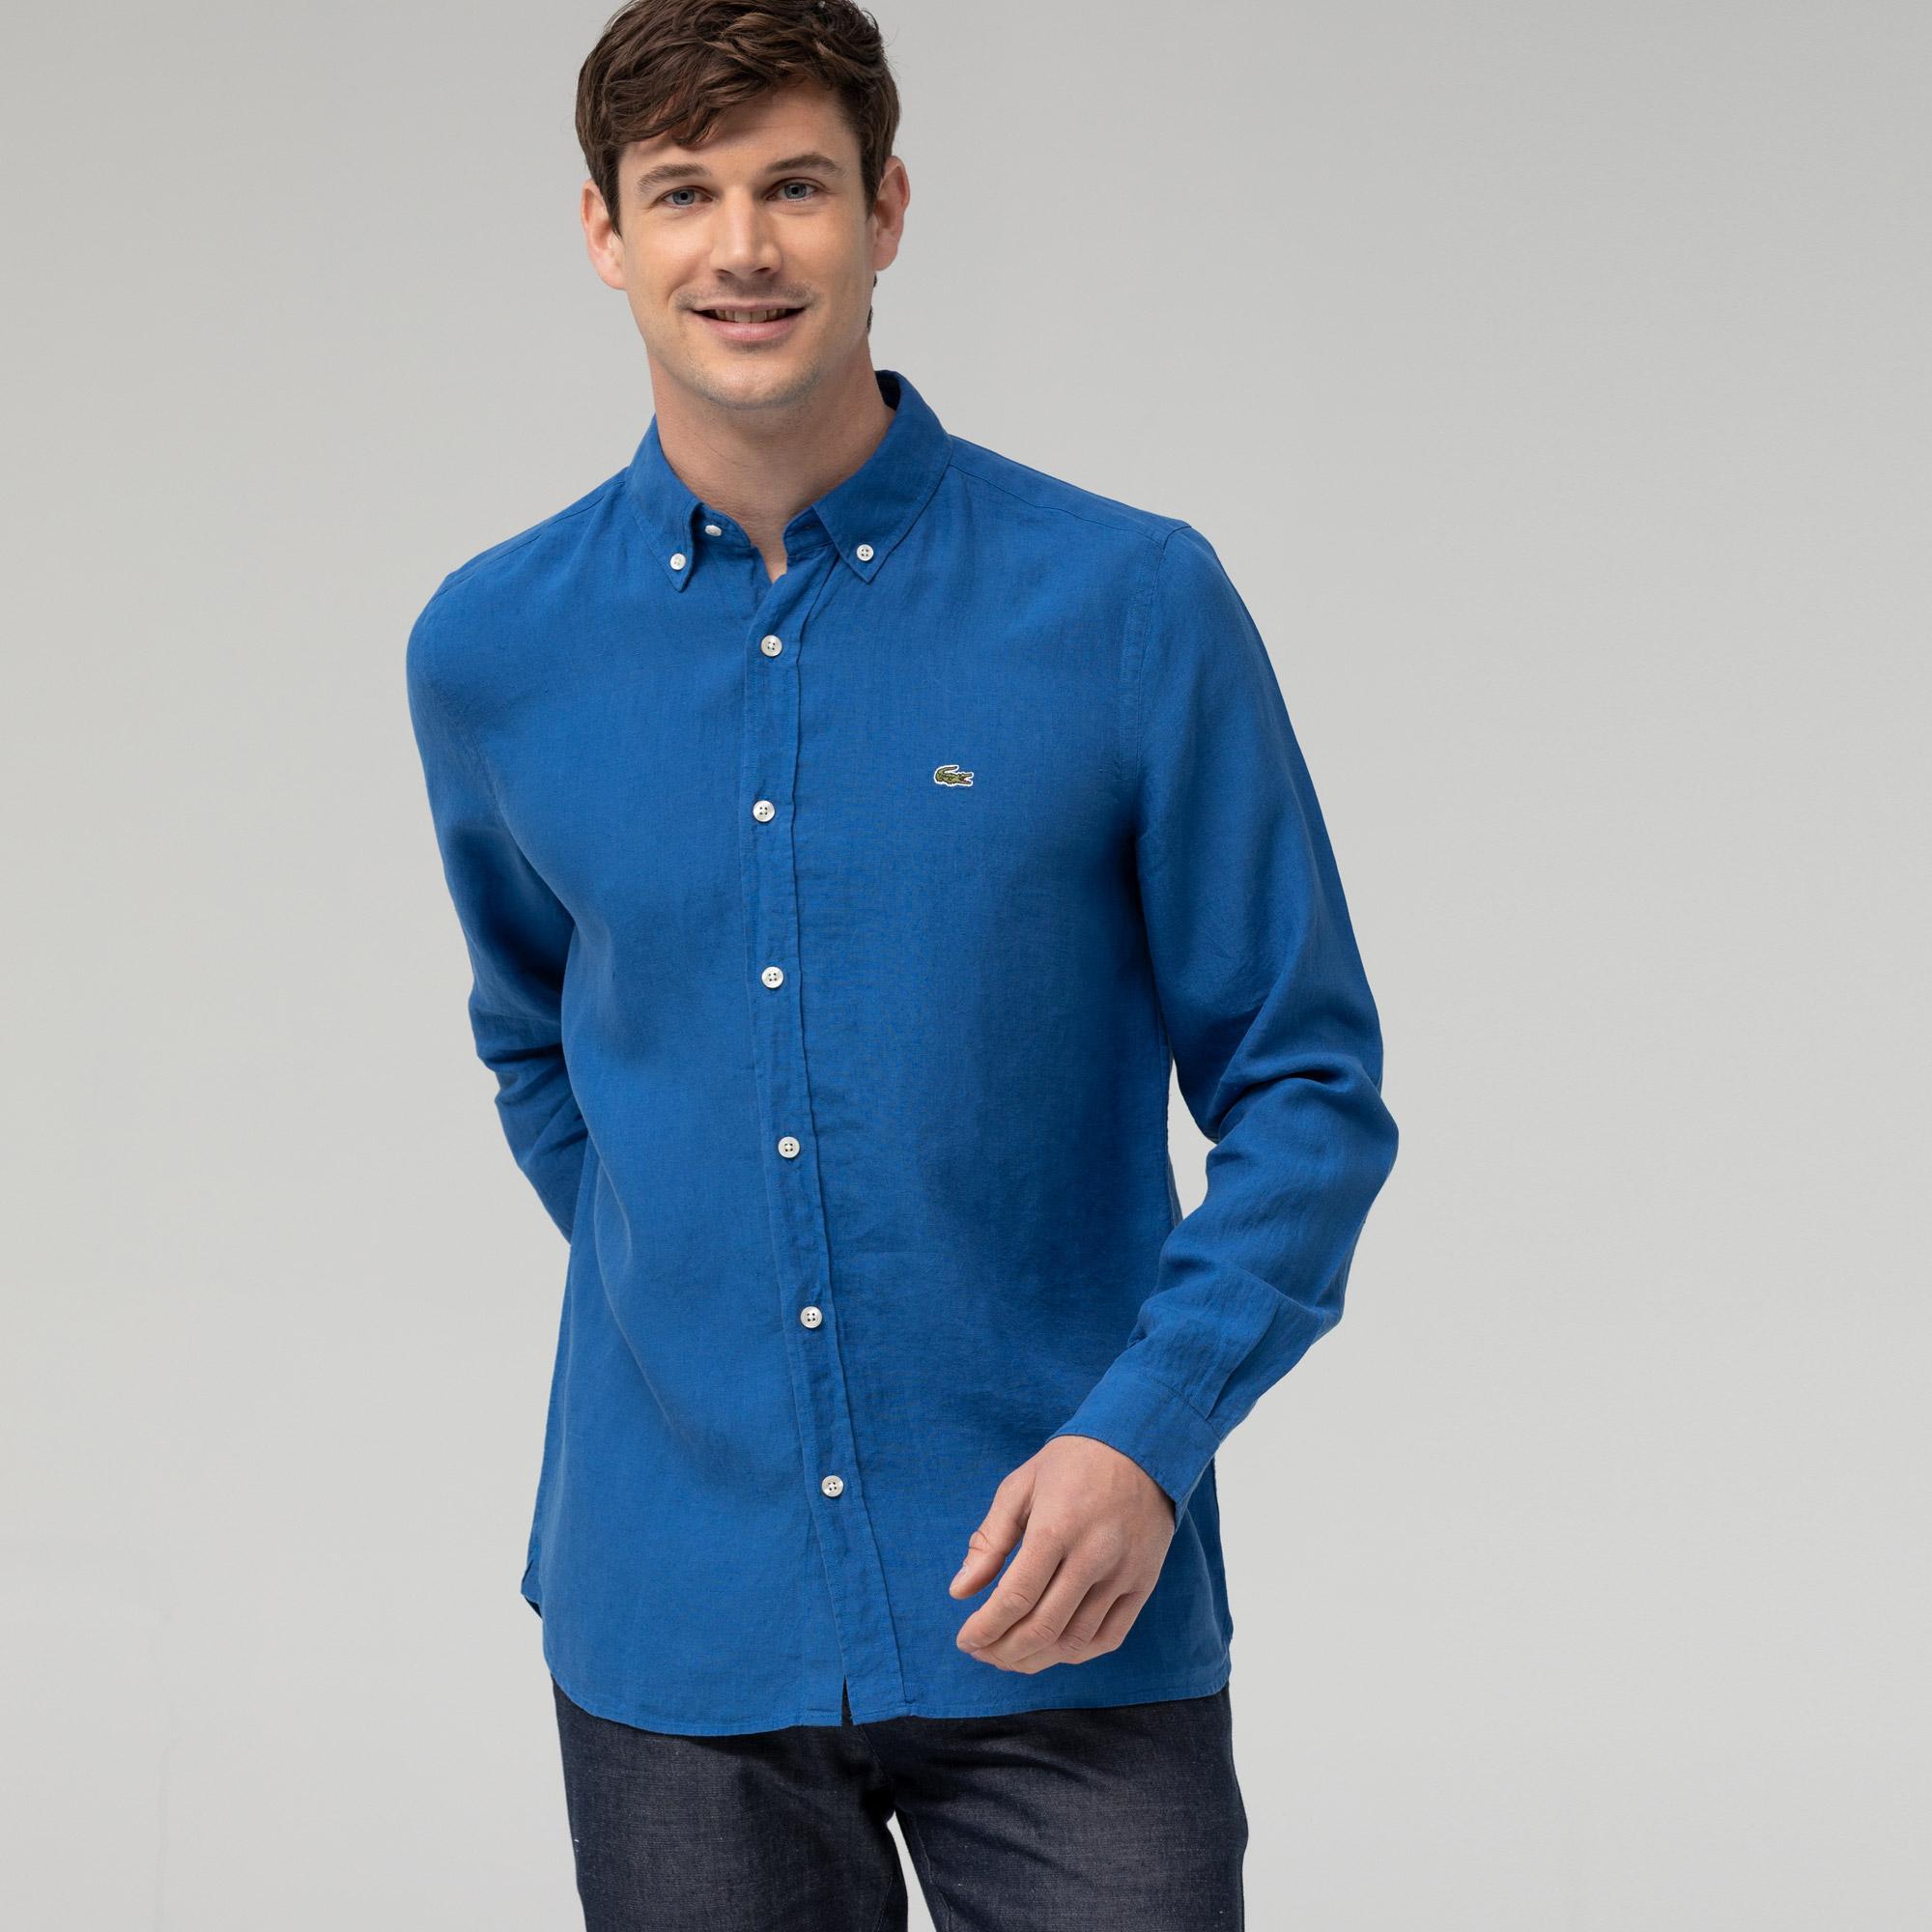 Lacoste Erkek Slim Fit Saks Mavi Gömlek